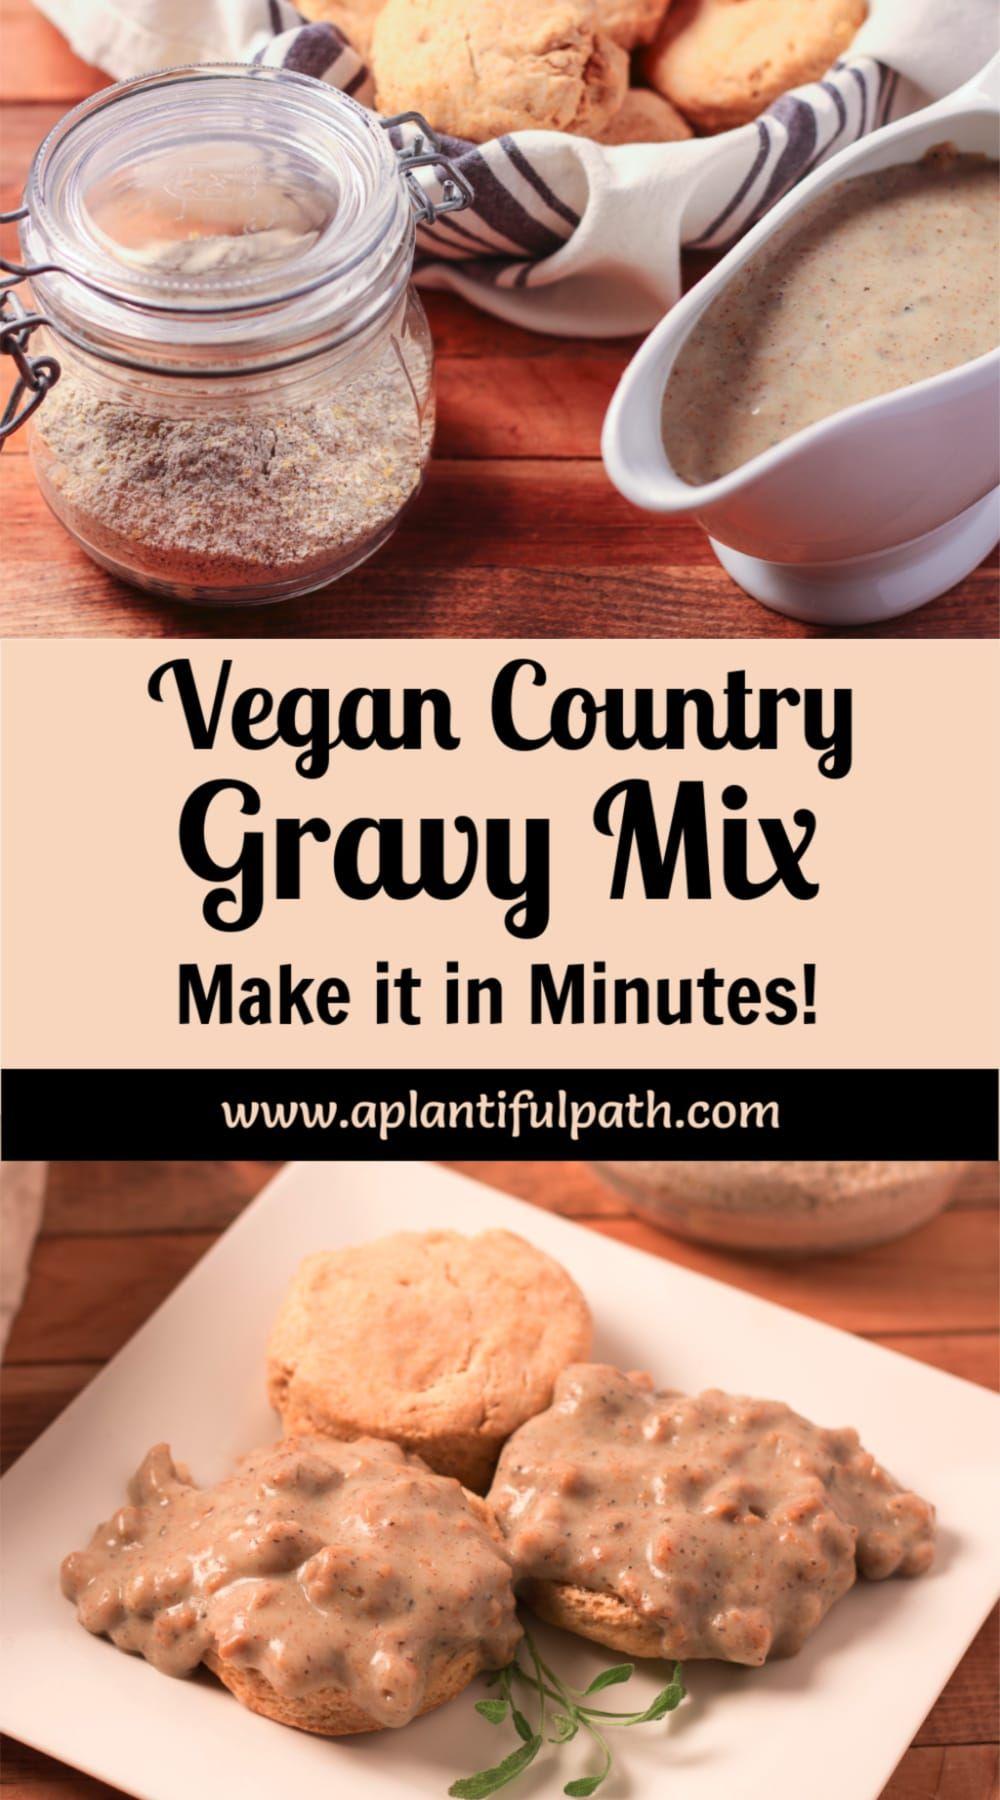 Easy Vegan Country Gravy Mix Oil Free A Plantiful Path Recipe In 2020 Oil Free Vegan Recipes Vegan Biscuits And Gravy Vegan Sausage